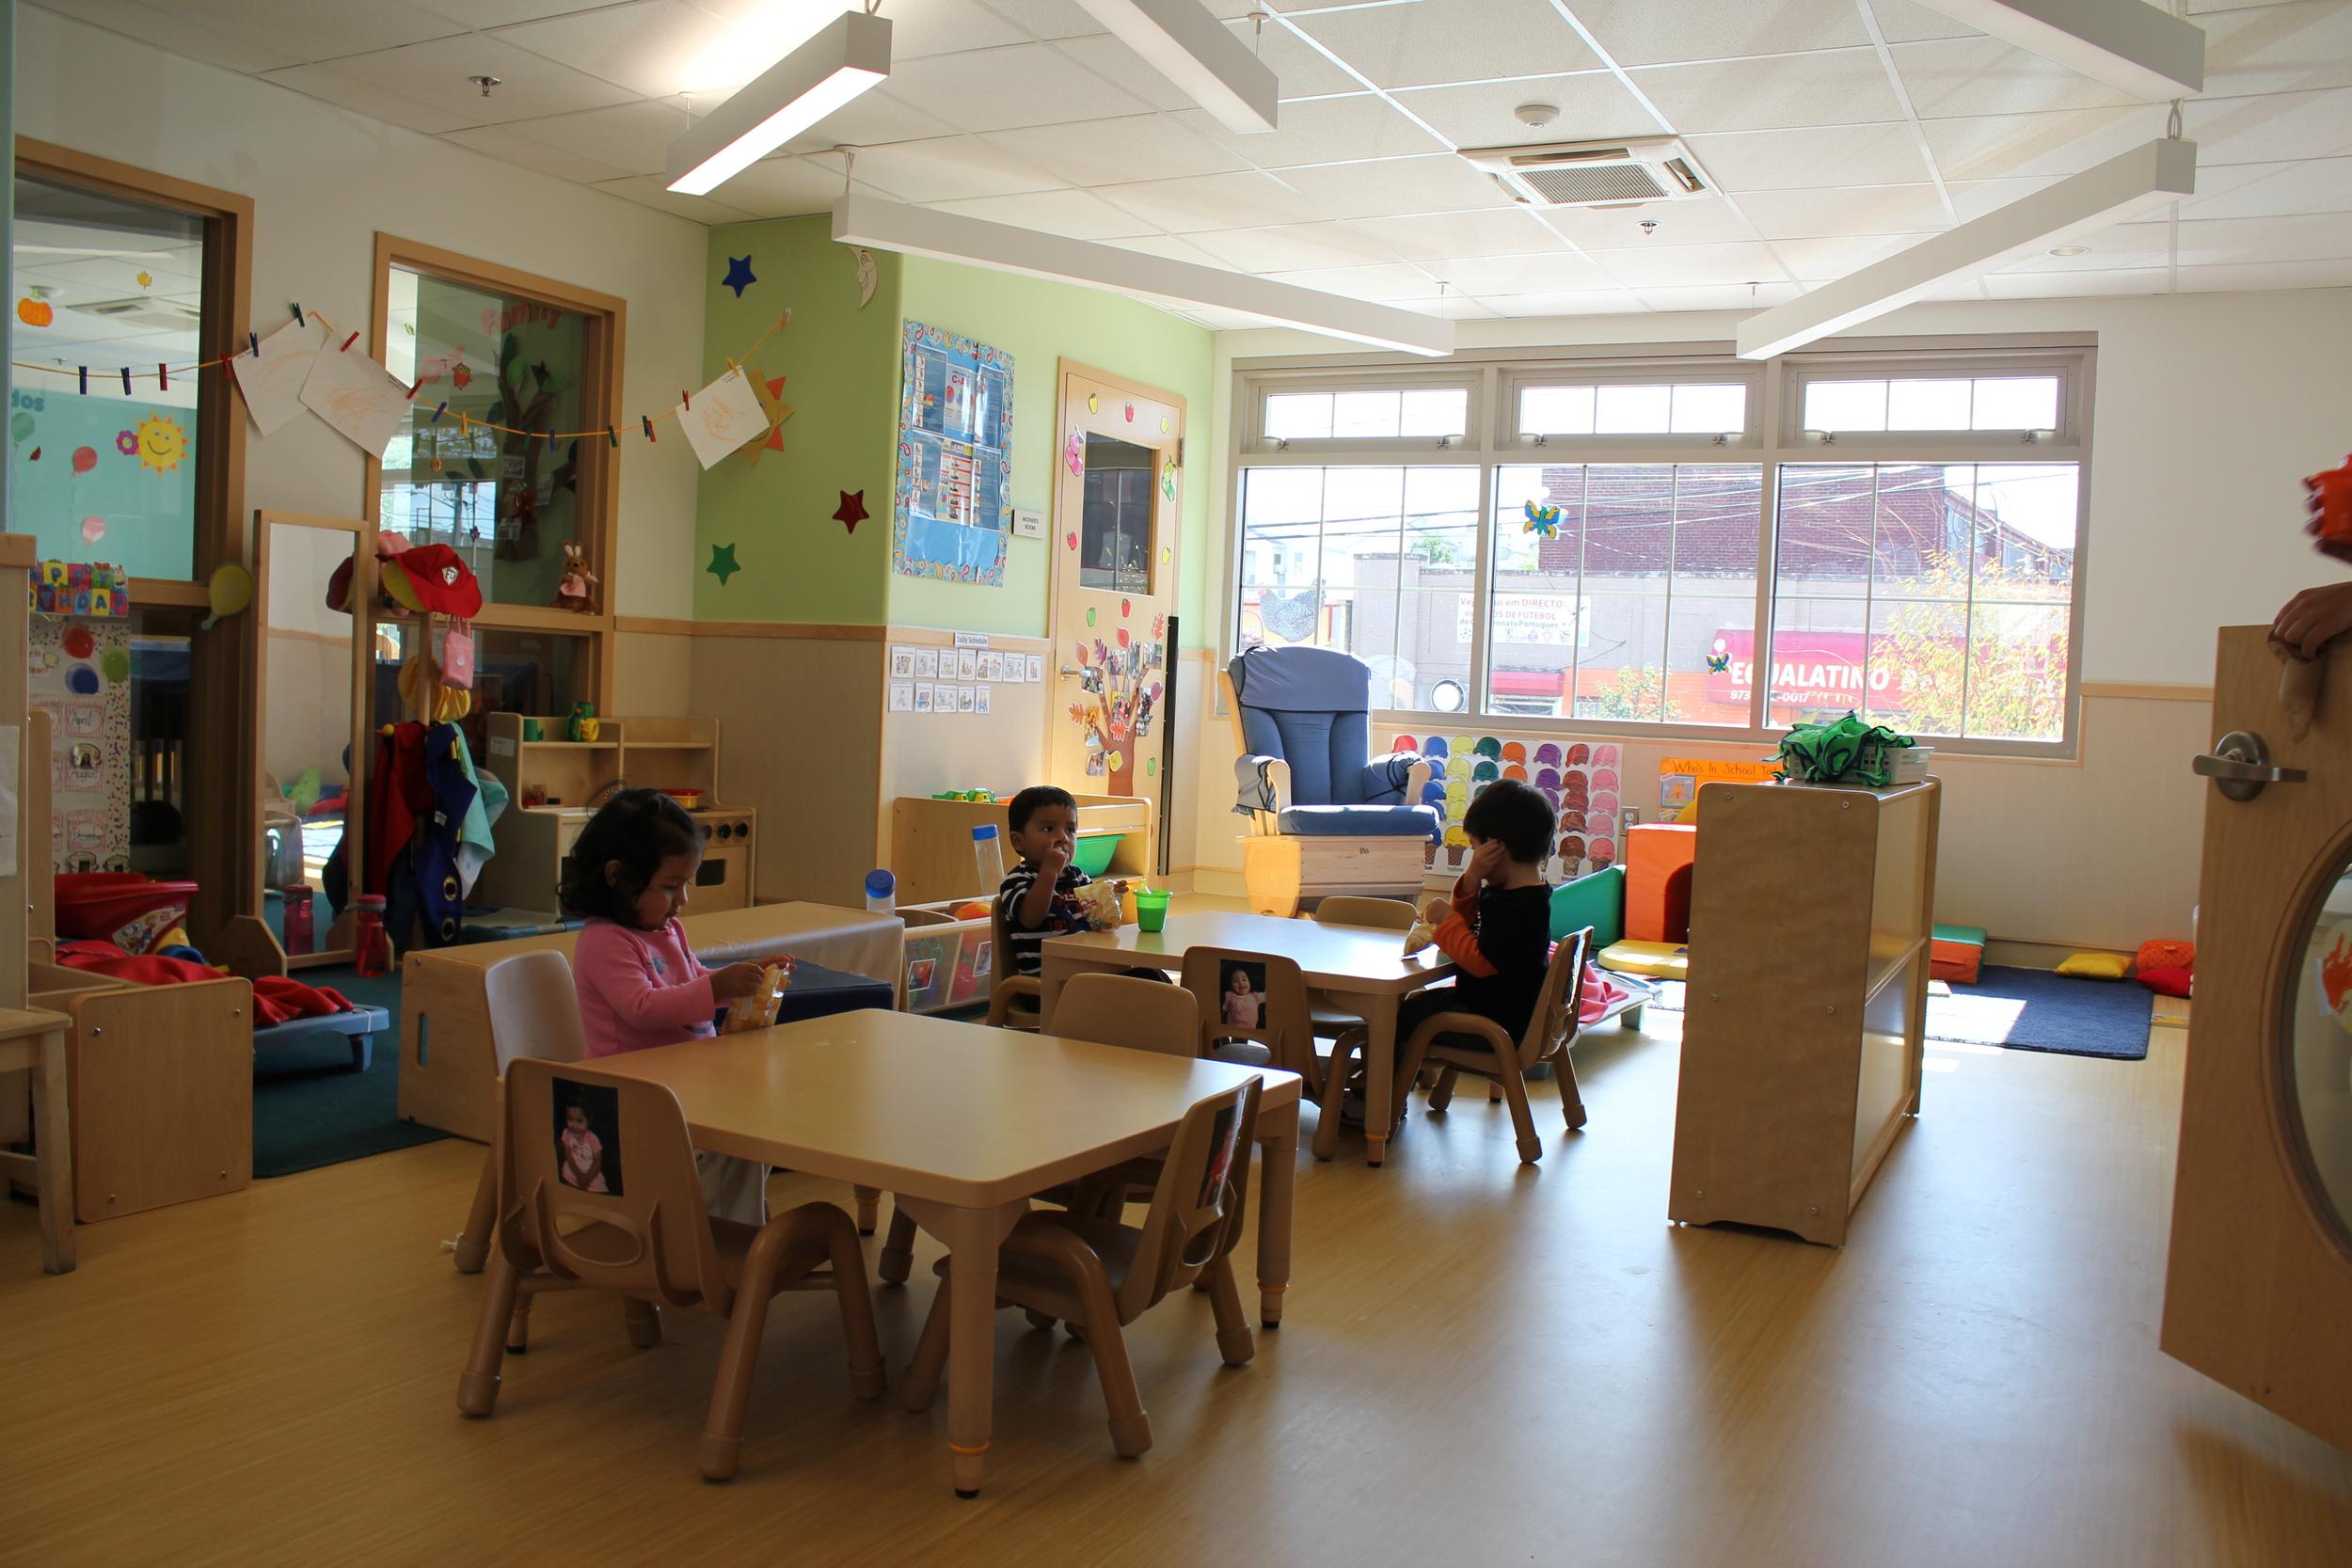 pho-int-classroom kids at table-72ppi-72x48.JPG